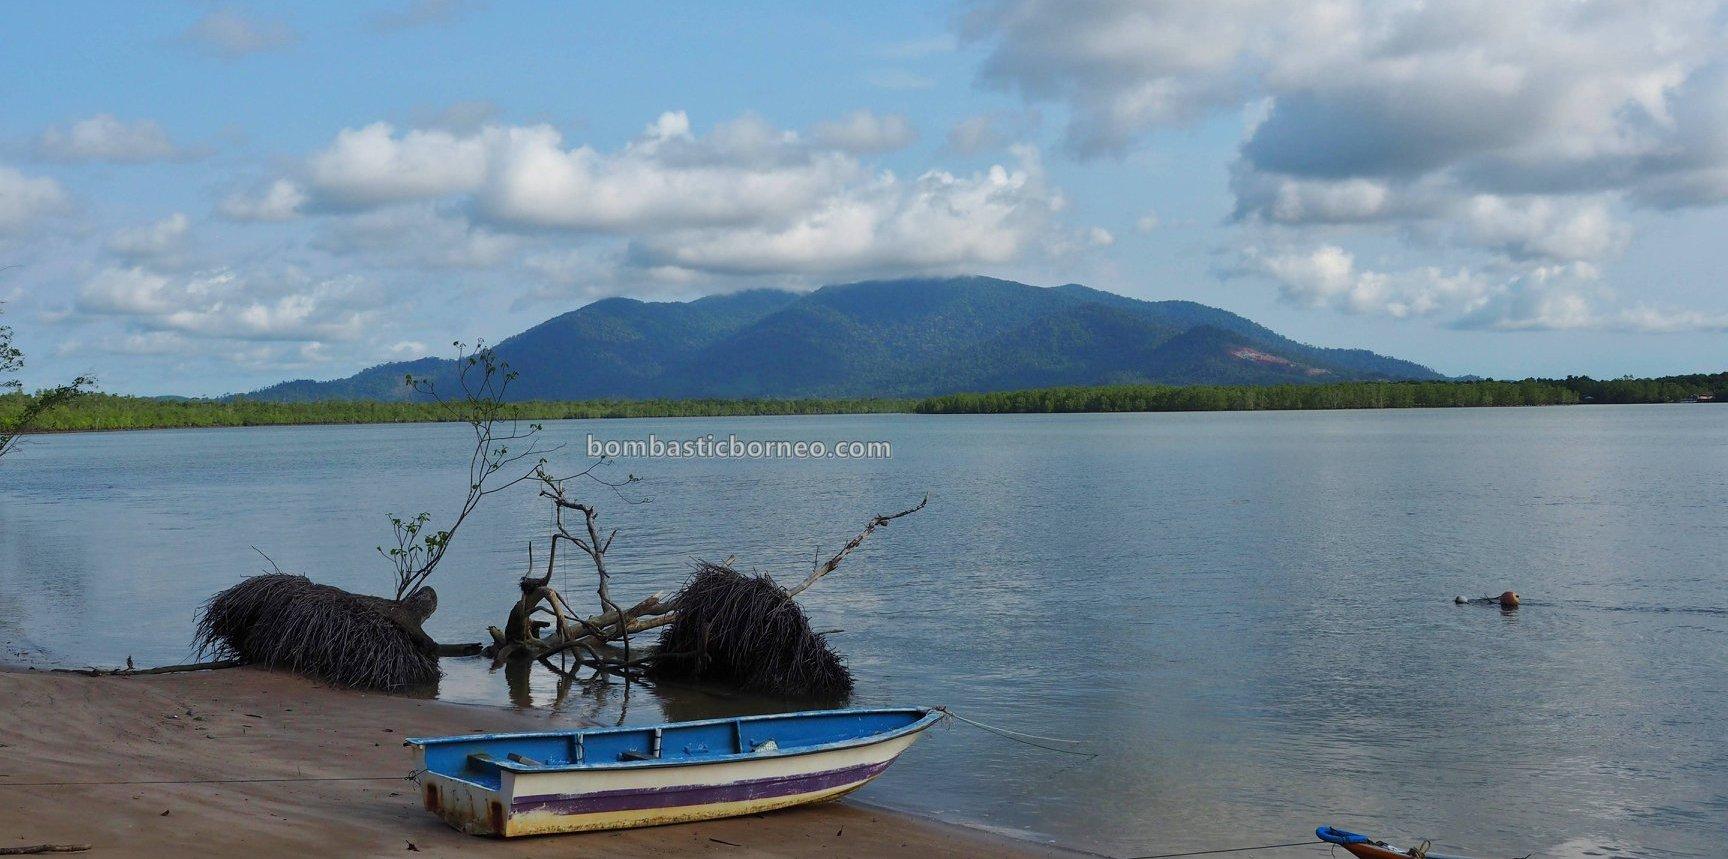 Bukit Gondol, Kampung, Beach, nature, backpackers, exploration, family vacation, Borneo, Kuching, Sematan, Tourism, tourist attraction, crossborder, 砂拉越海滩, 马来西亚旅游